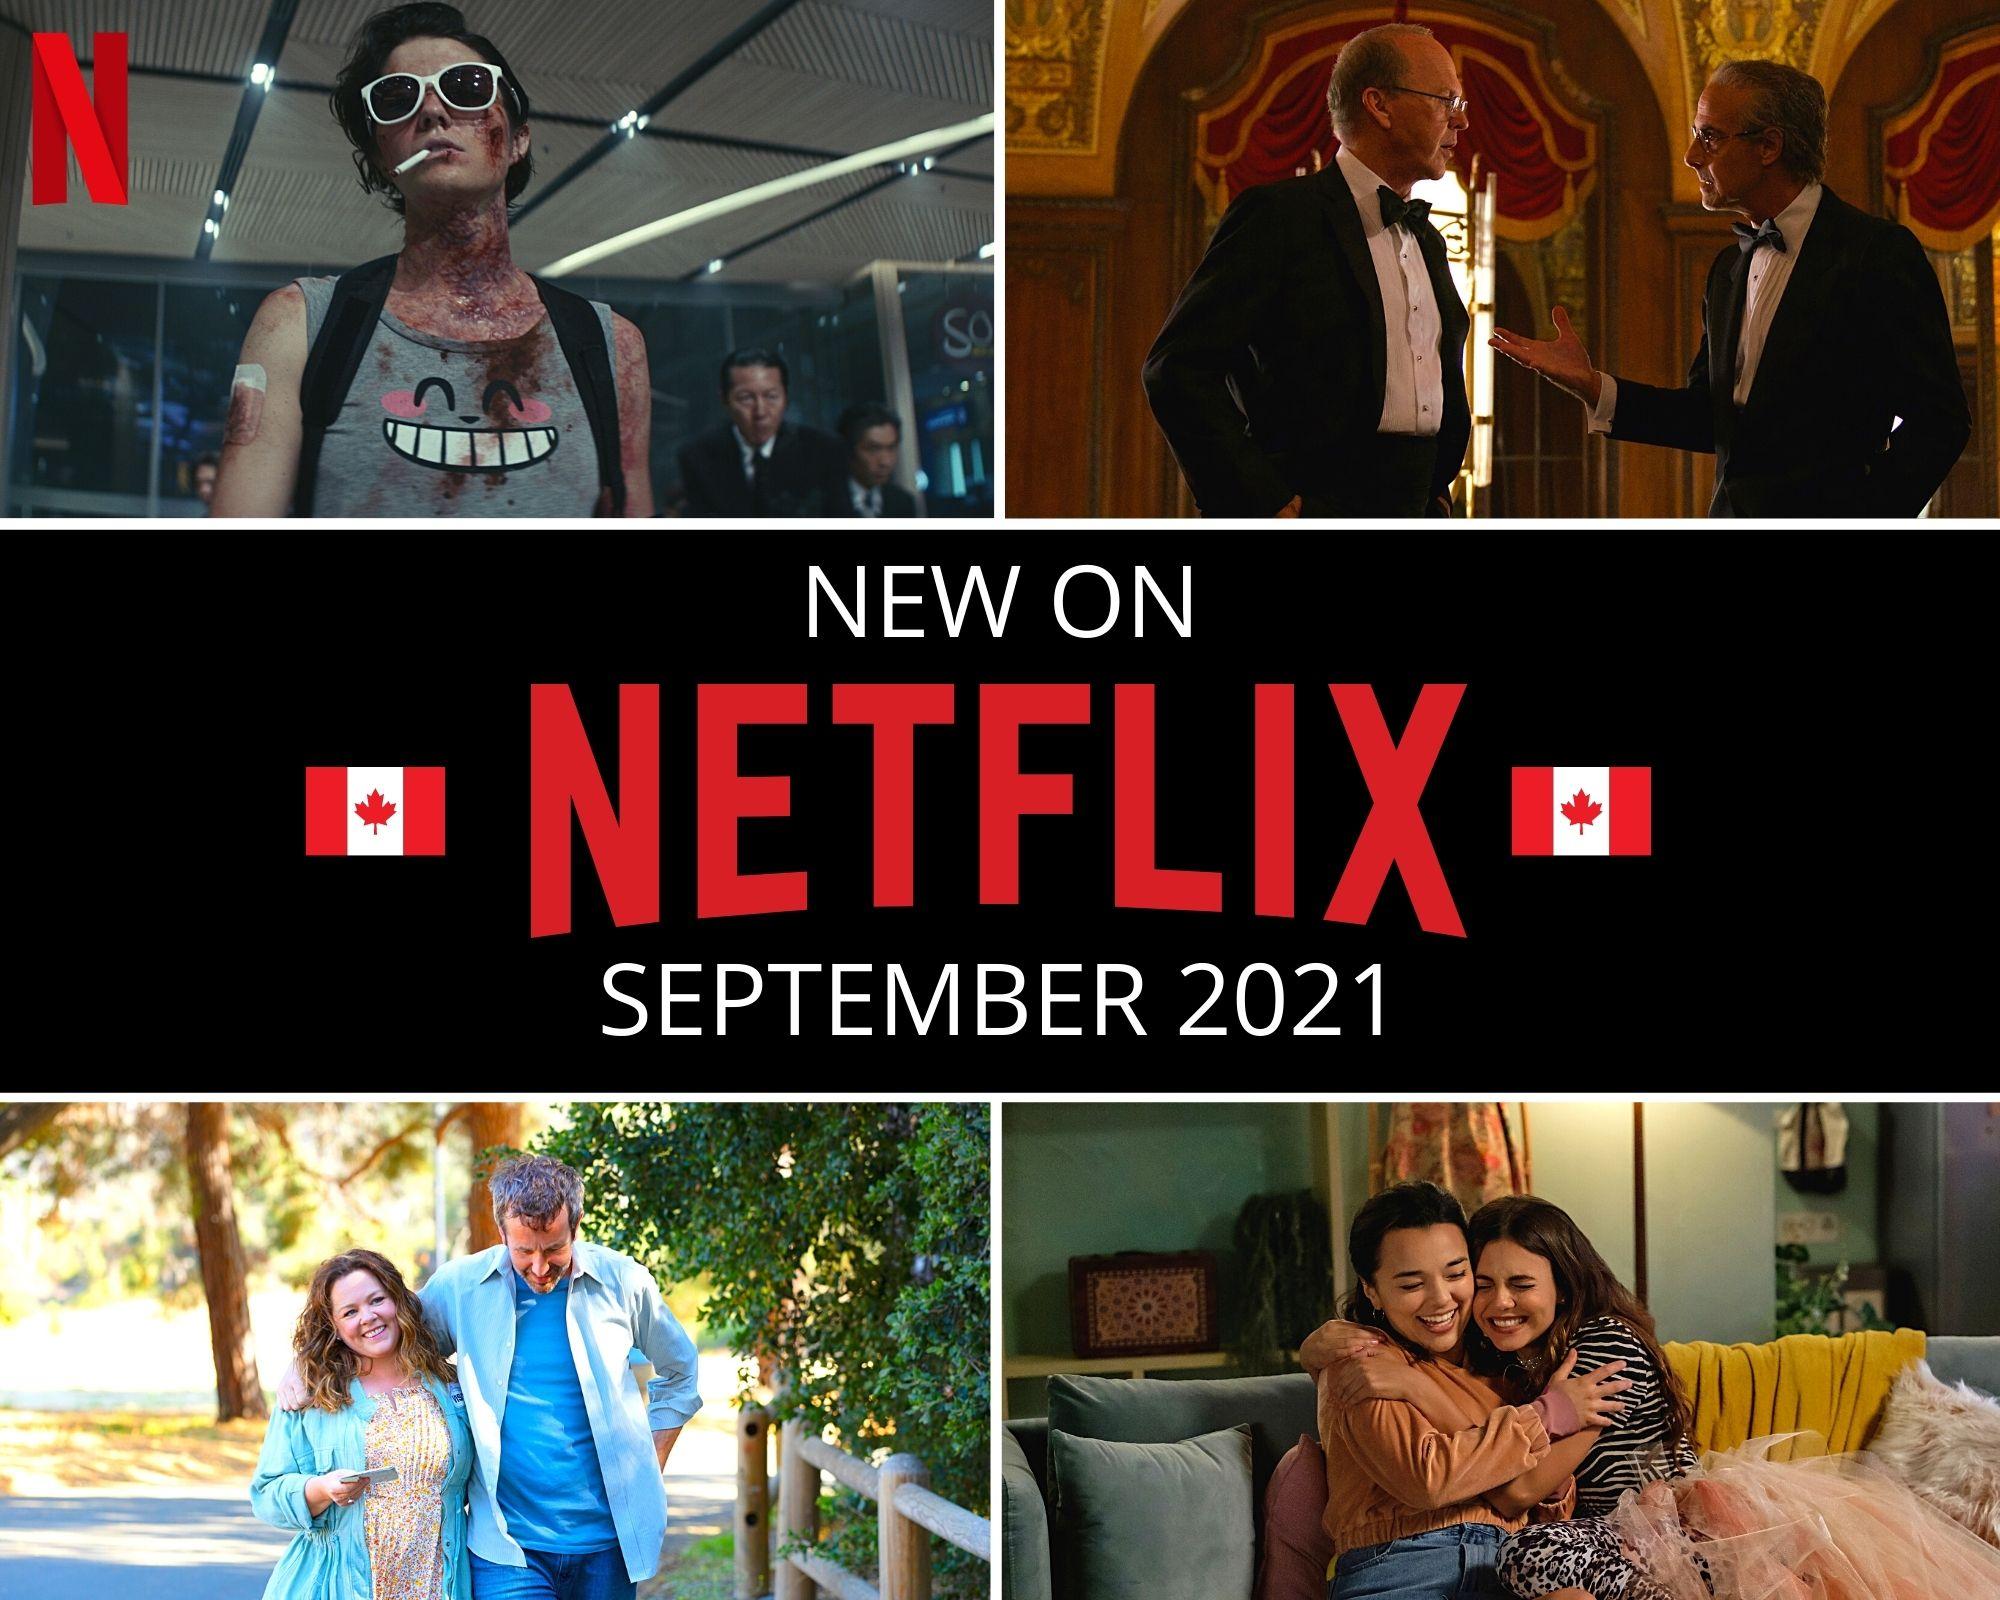 New on Netflix September 2021 Canada